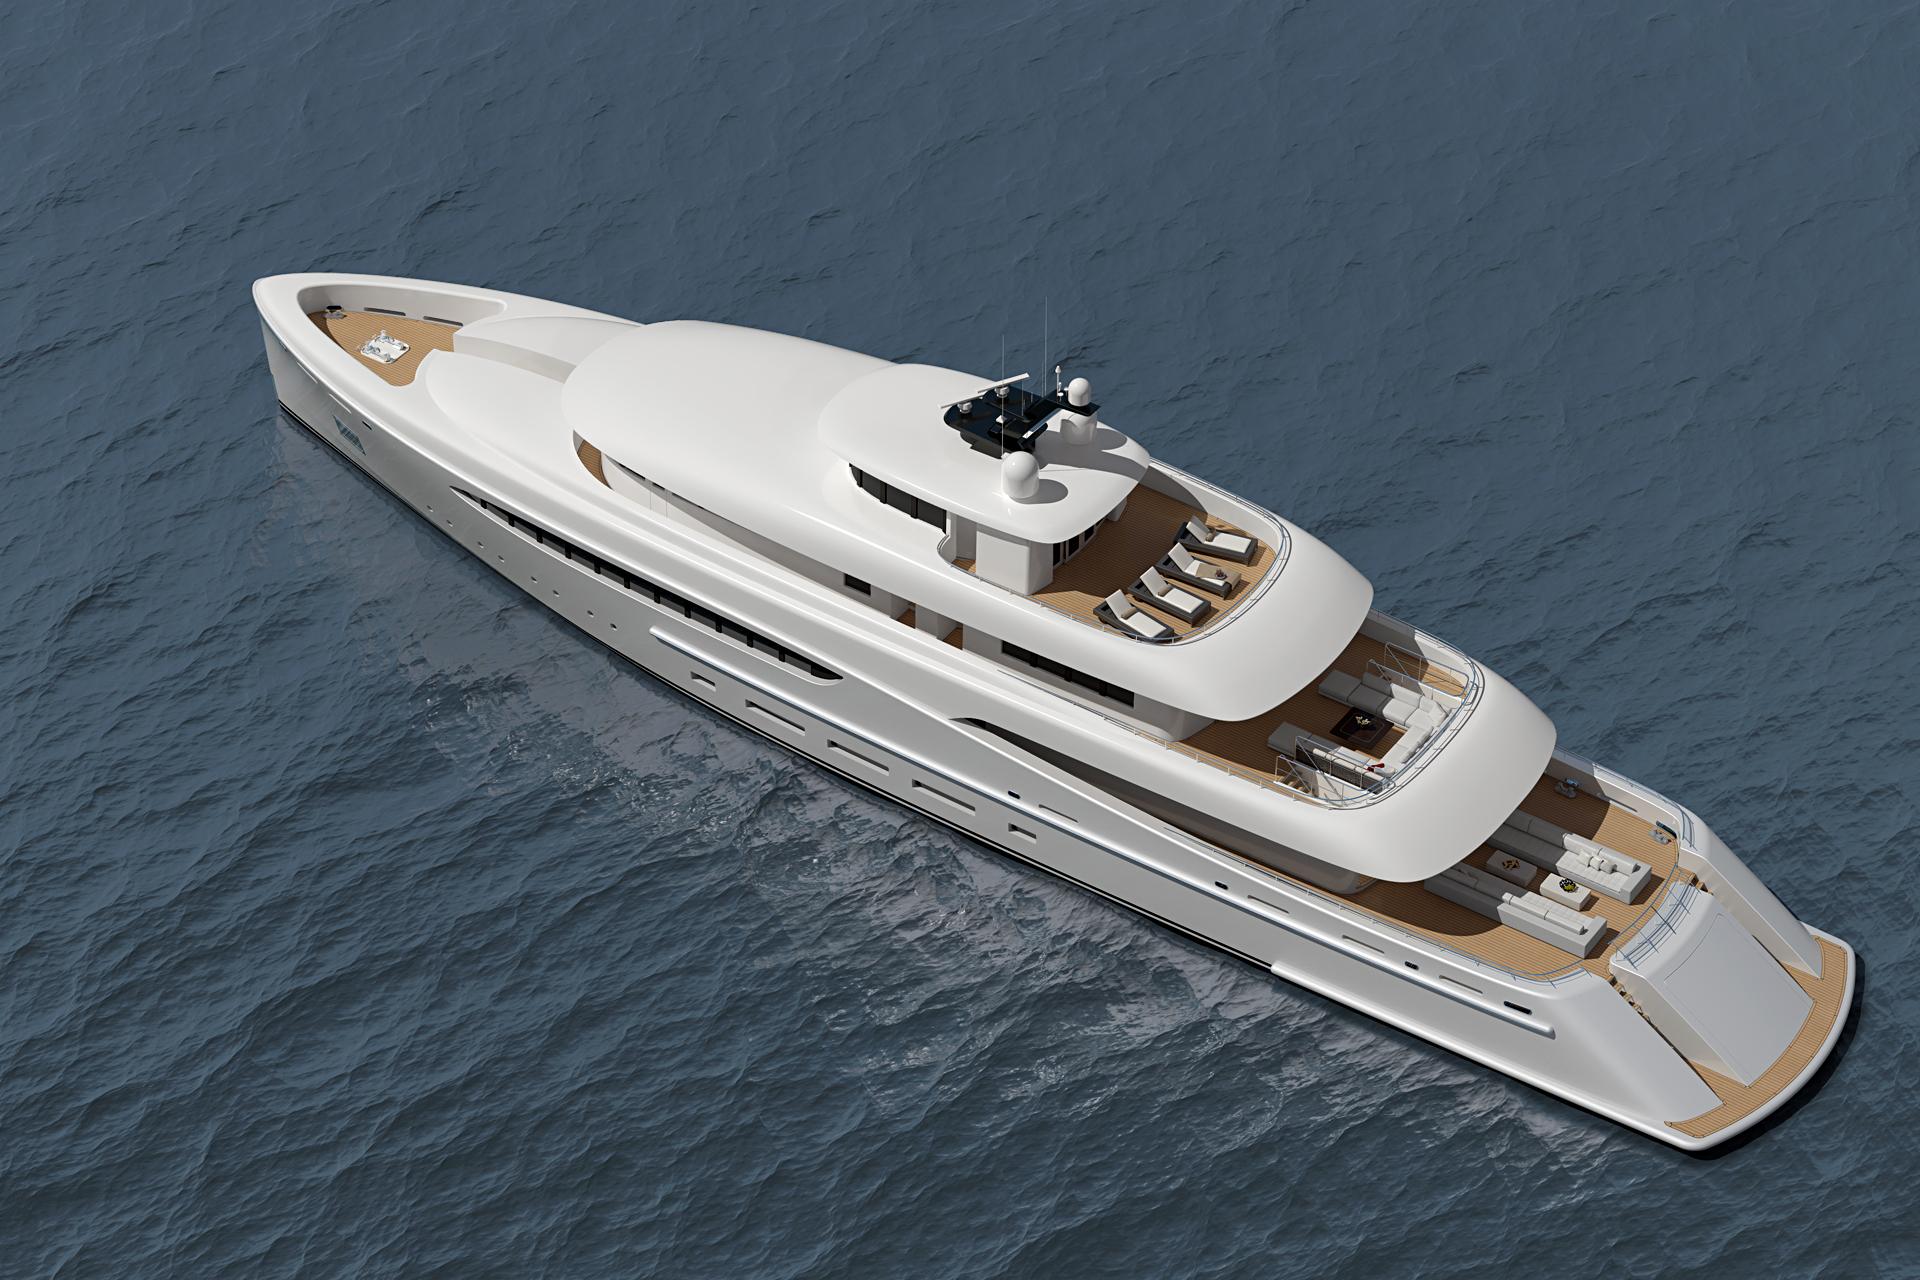 luxury motor yacht project by nick mezas yacht design luxury yacht